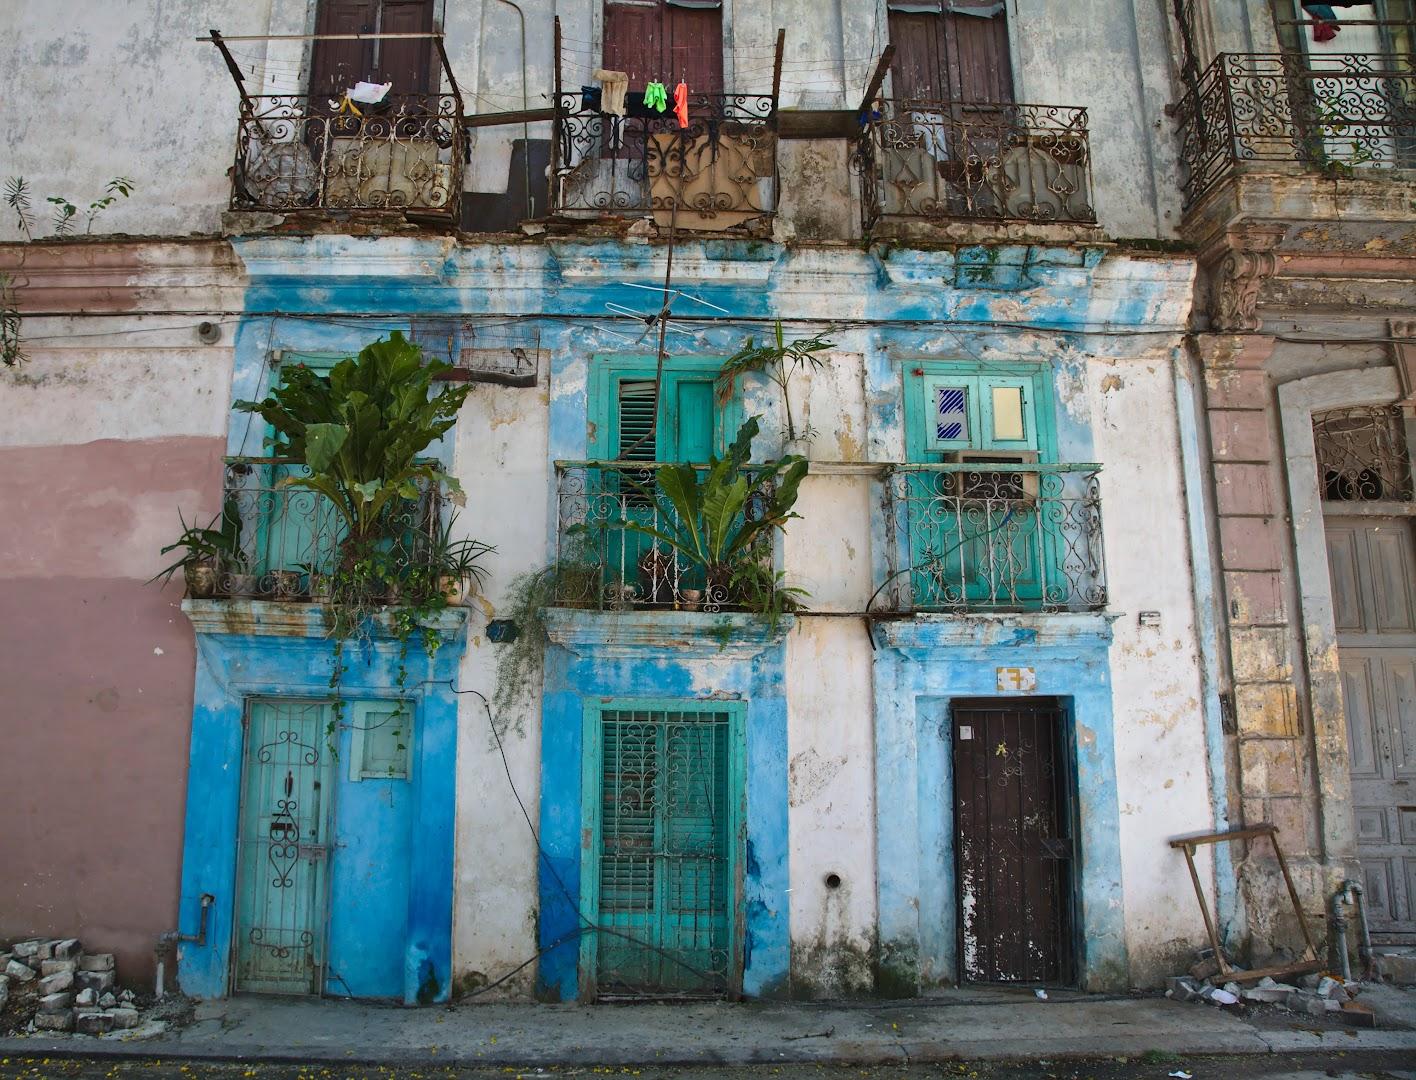 Havana has beatiful architecture, but it is deteriorating